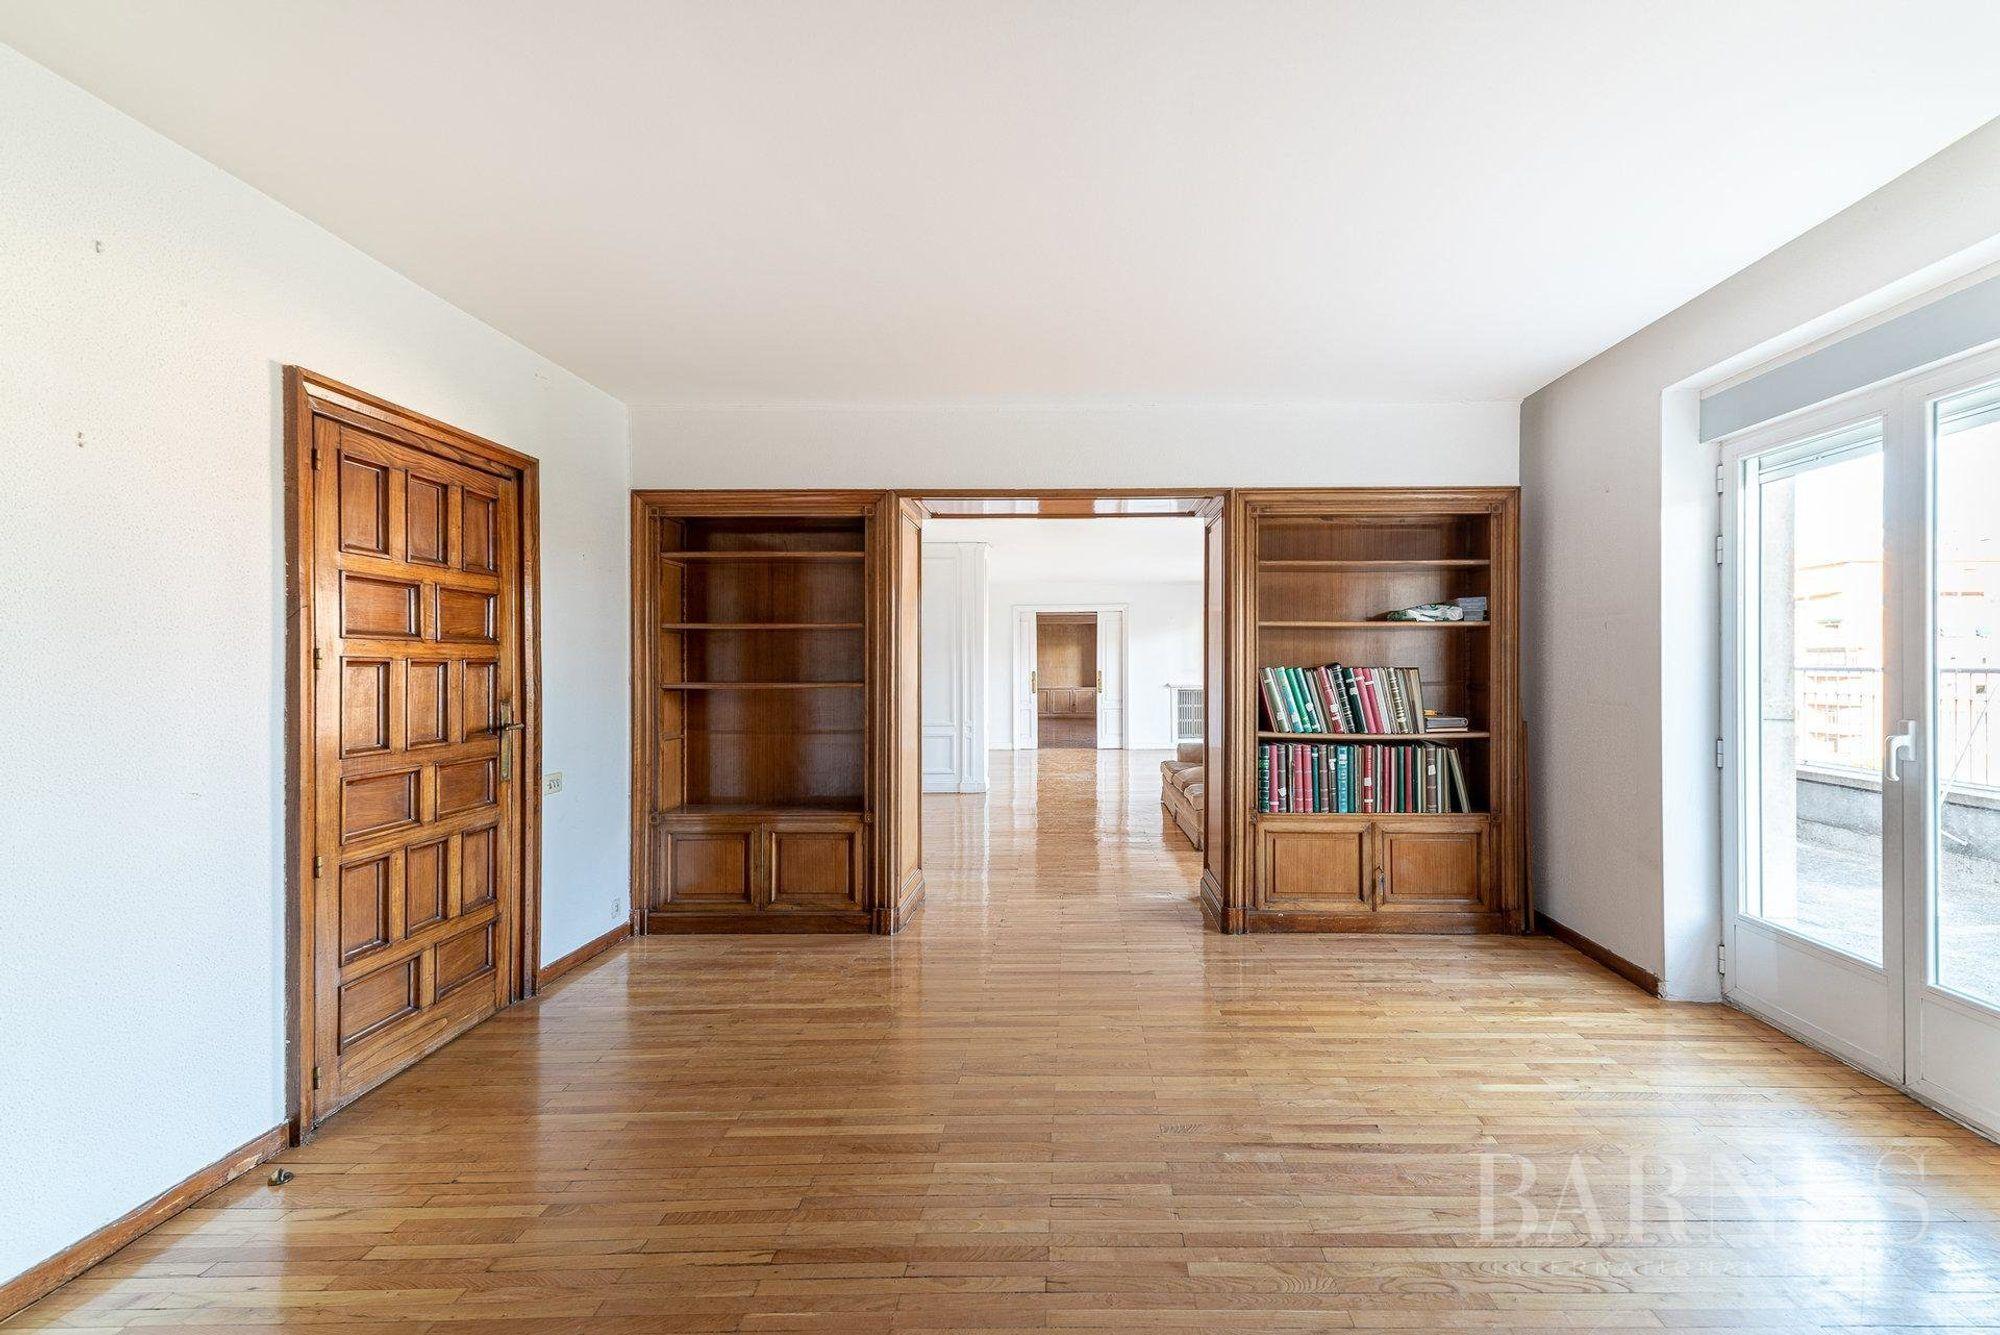 Sale - Apartment Madrid (Nueva España) in Madrid, Spain ...